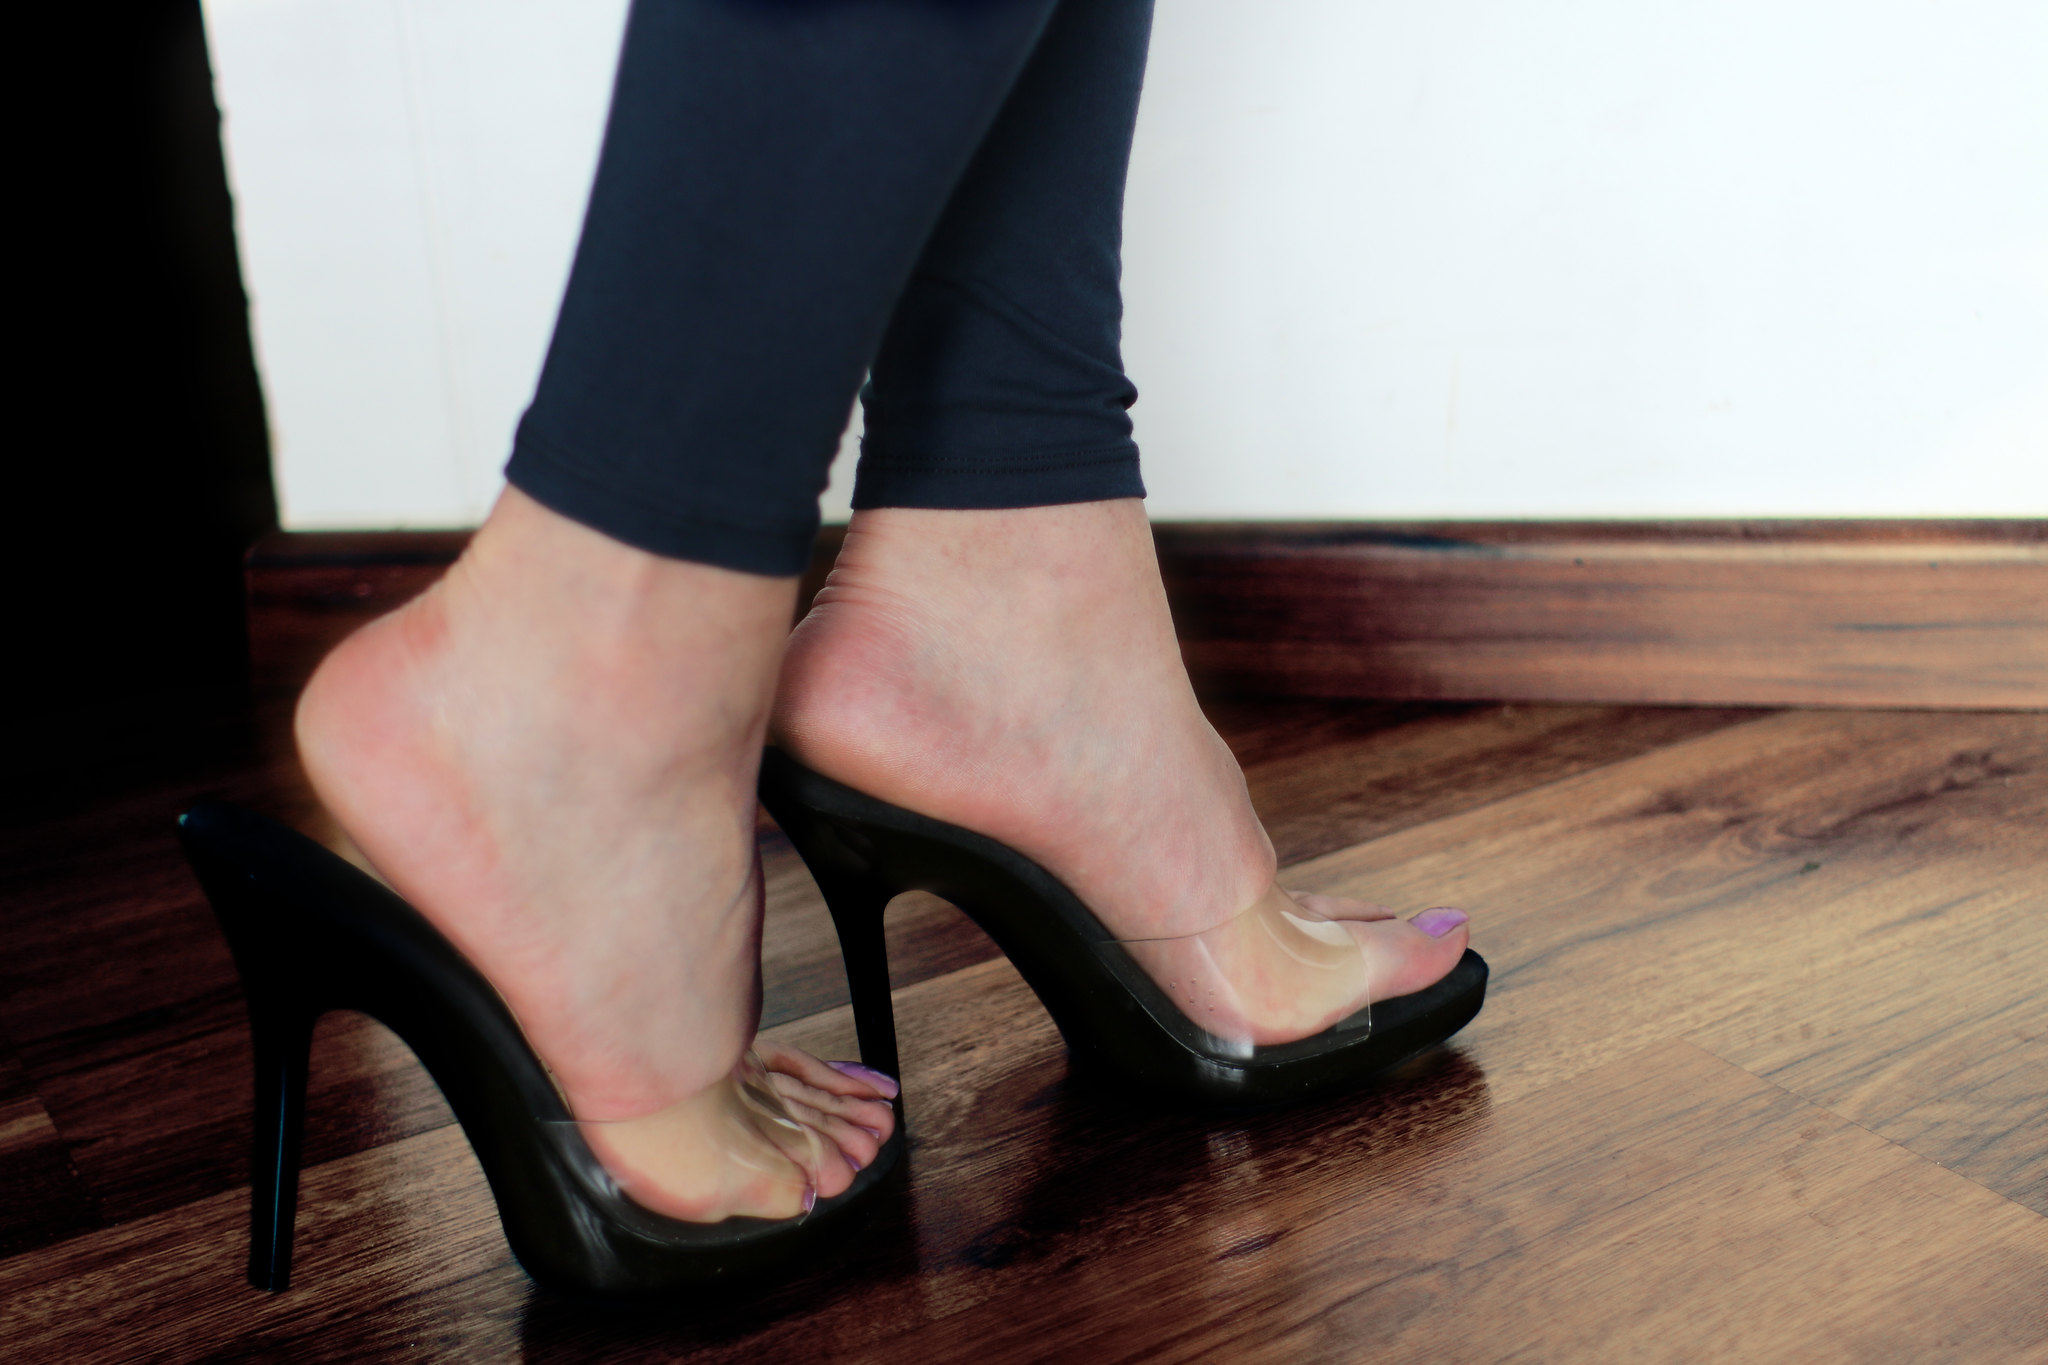 Mature feet on flickr